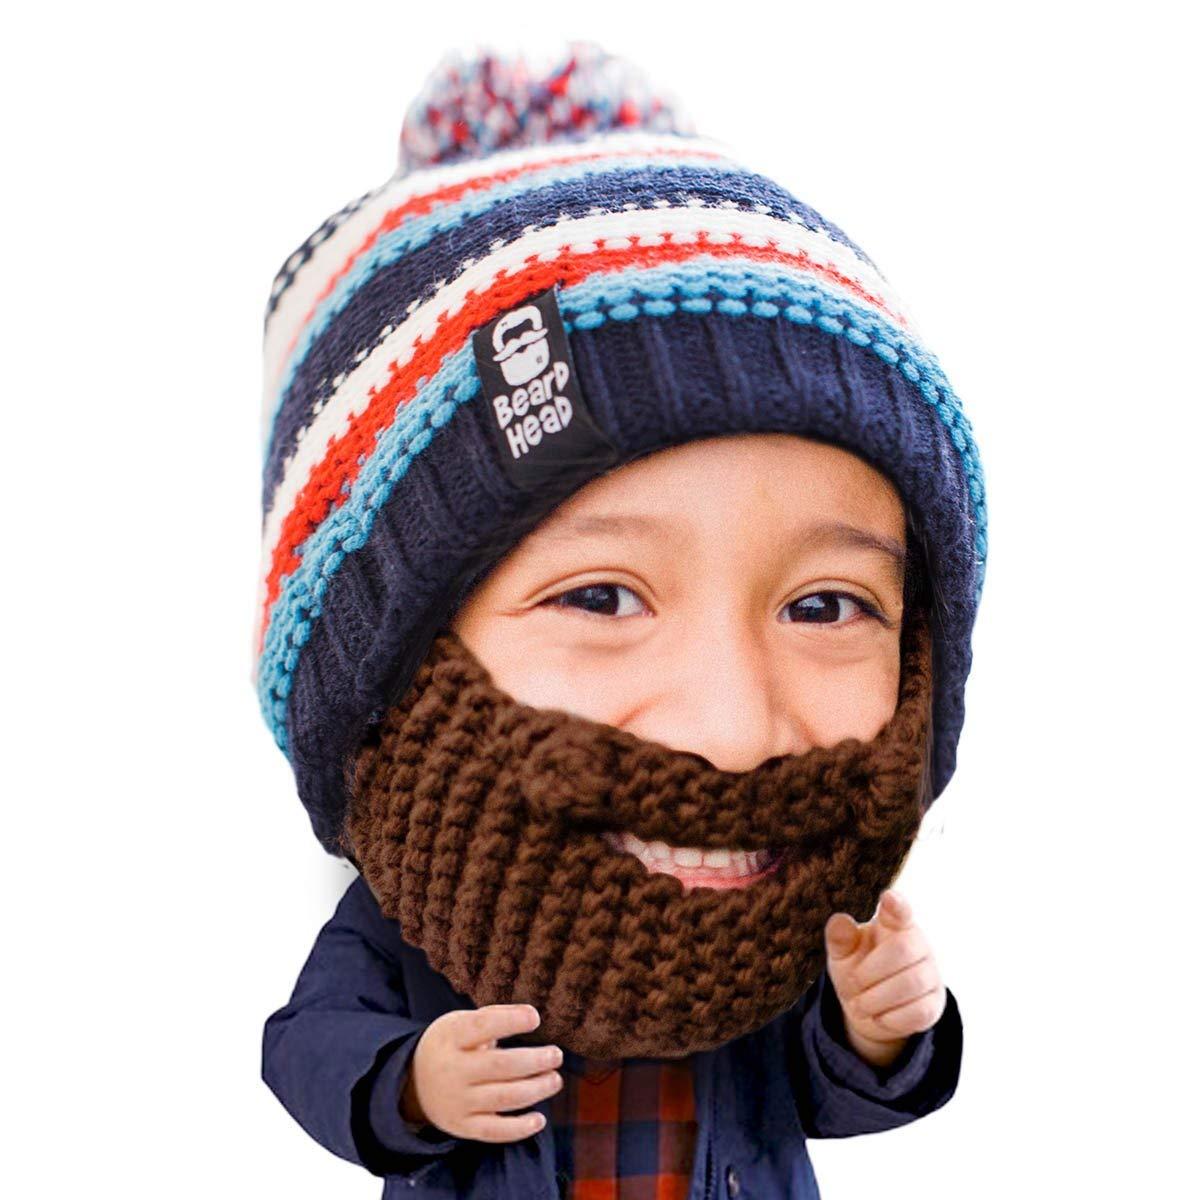 e1f622b90d1 Get Quotations · Beard Head Kid Gromm Beard Beanie - Knit Hat w Fake Beard  for Kids and